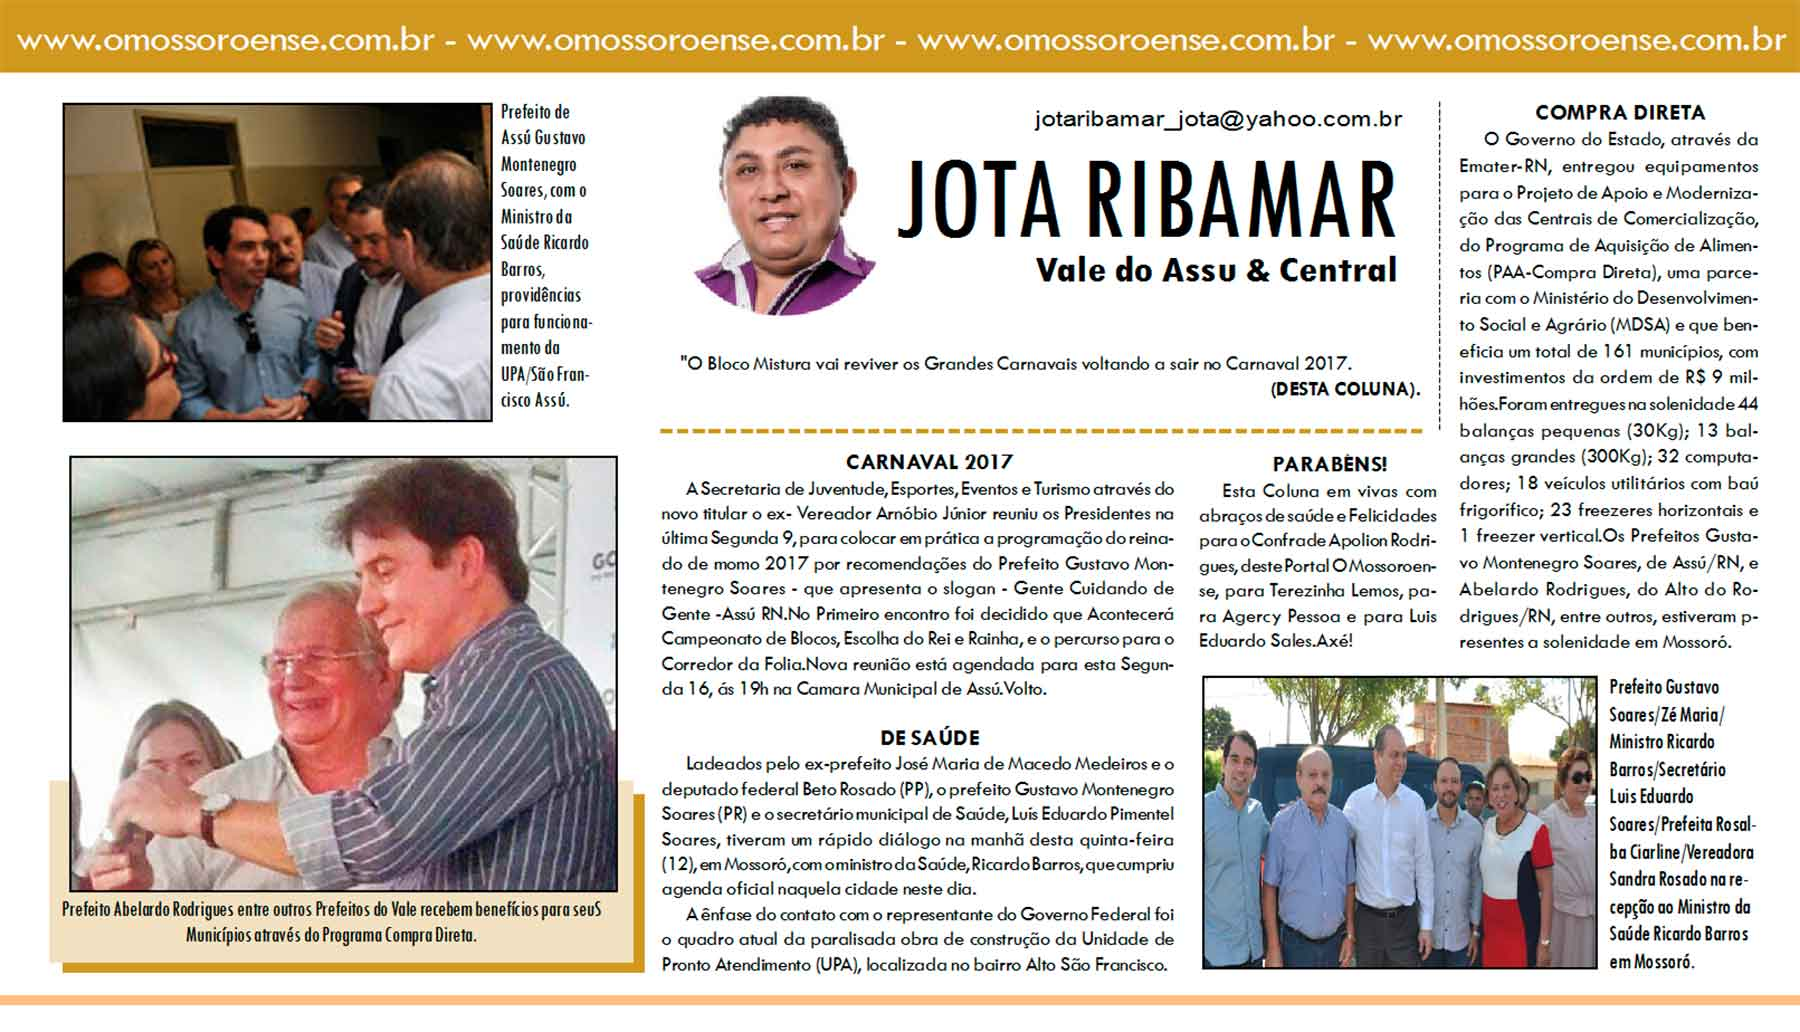 JOTA-RIBAMAR